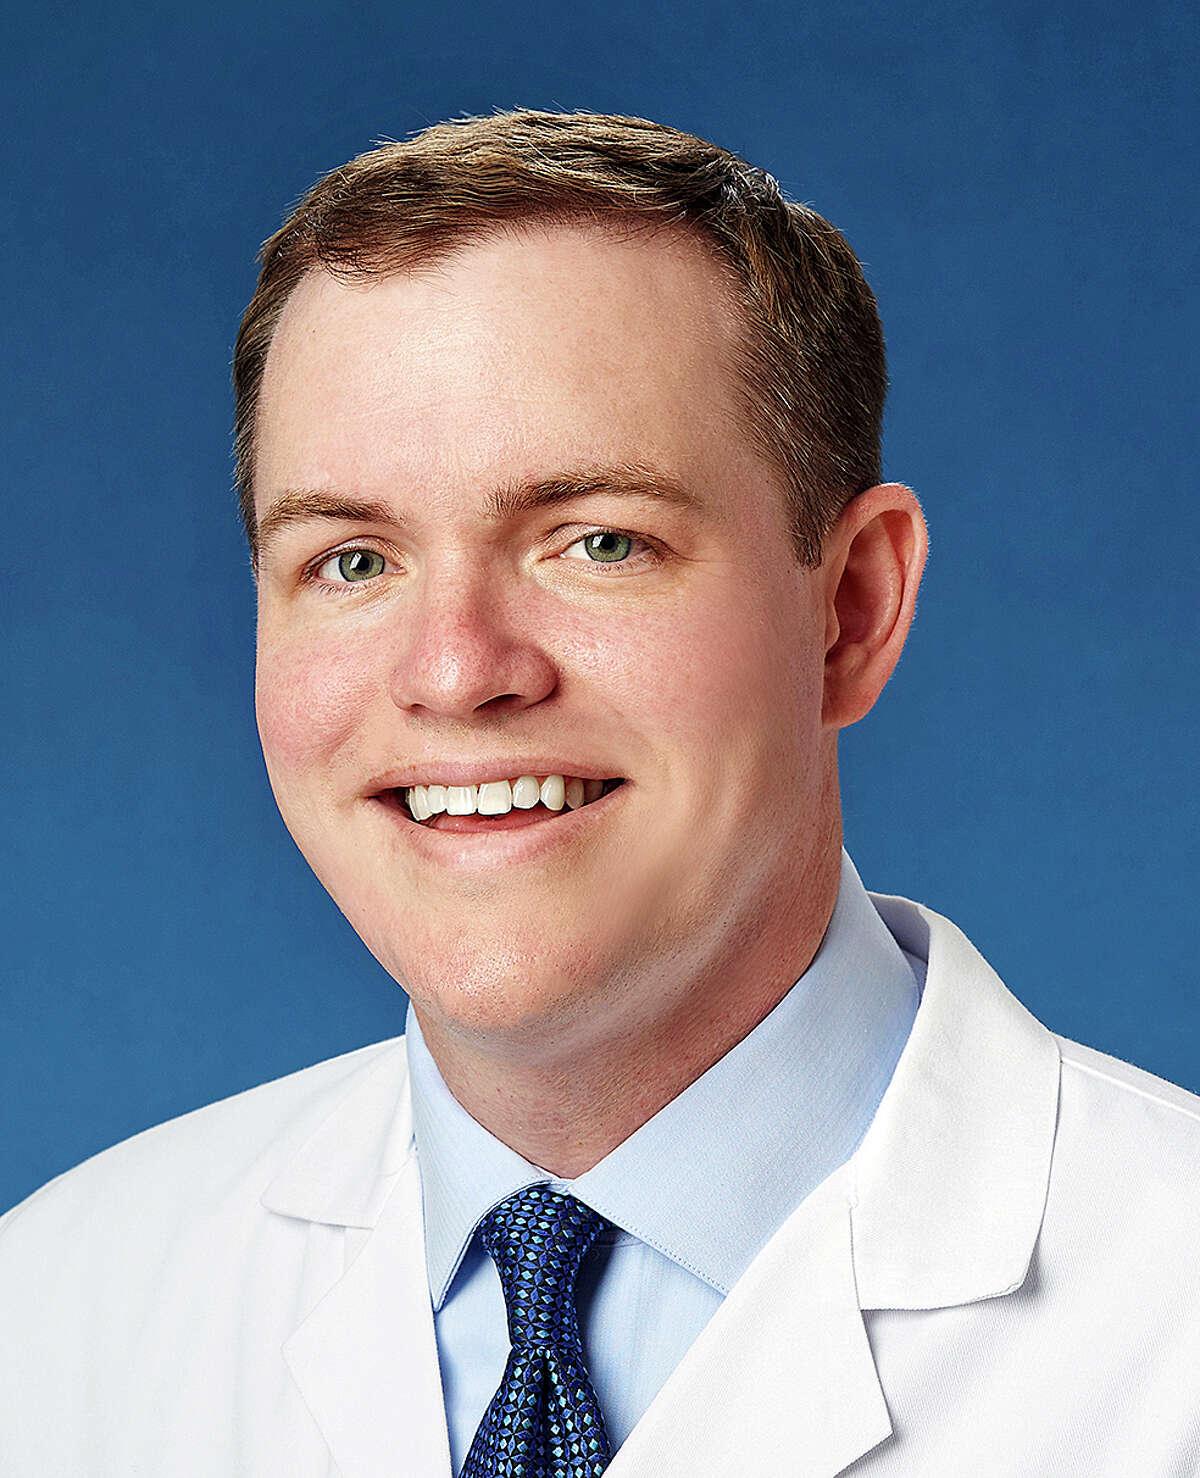 Jason Westin, candidate for Congress